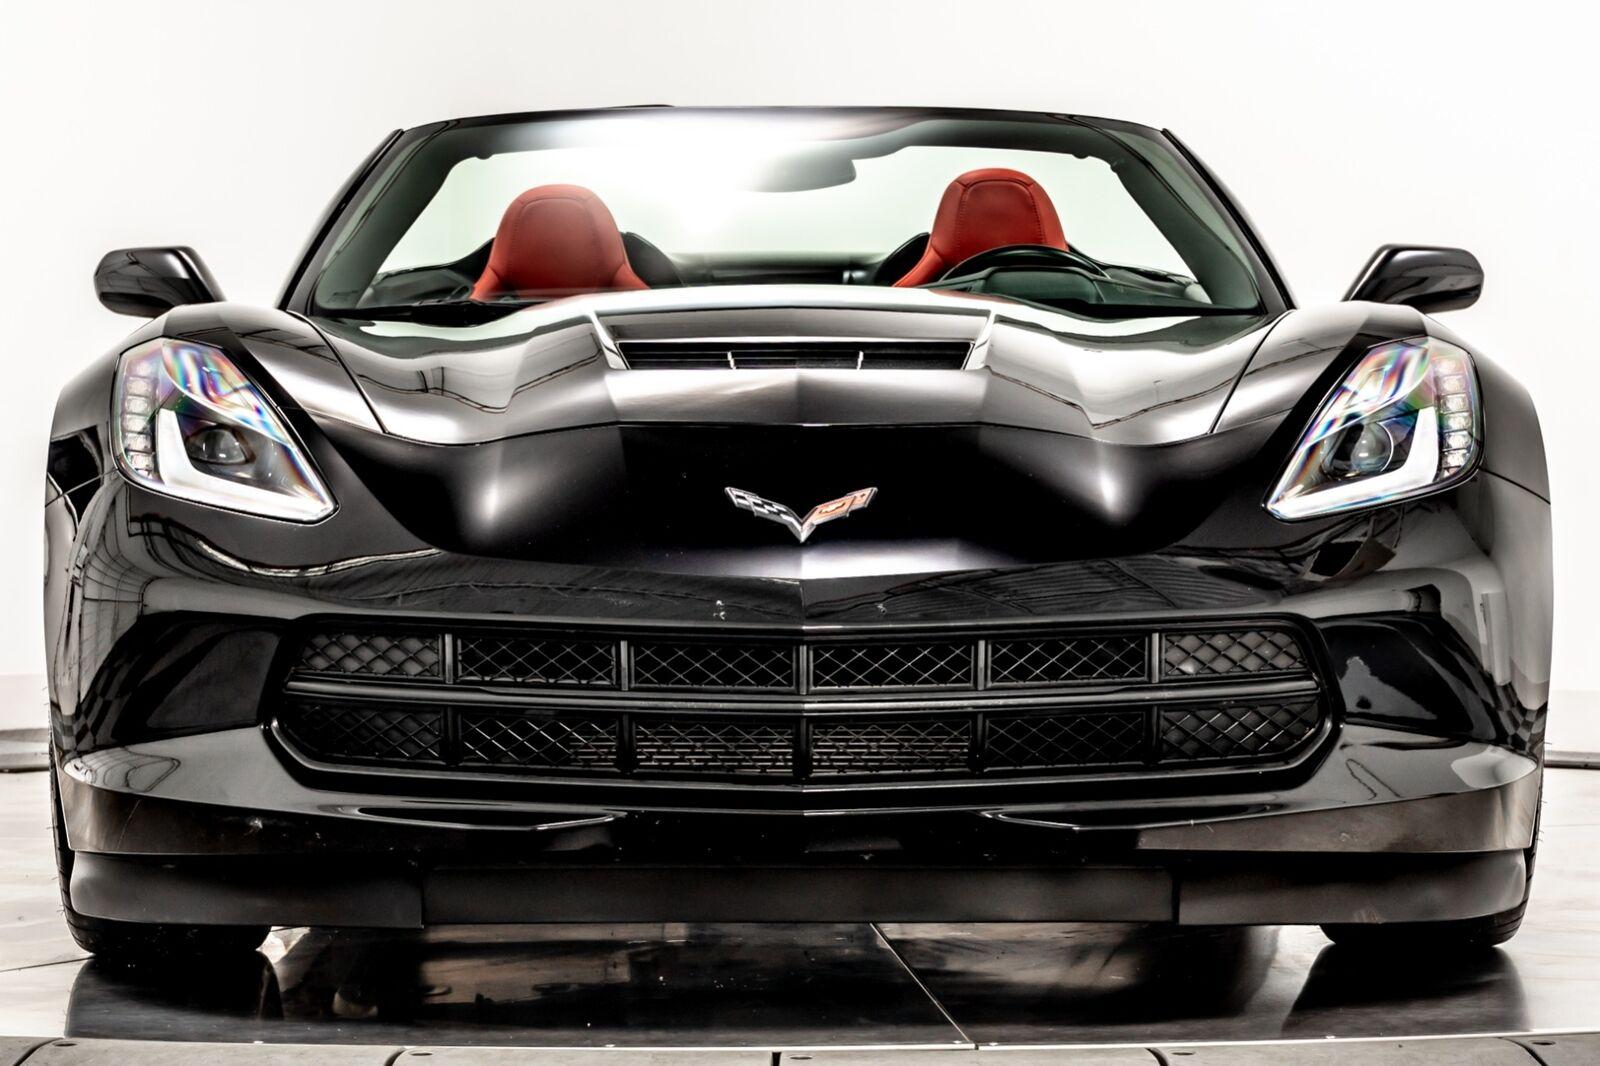 2014 Black Chevrolet Corvette Convertible 2LT   C7 Corvette Photo 3